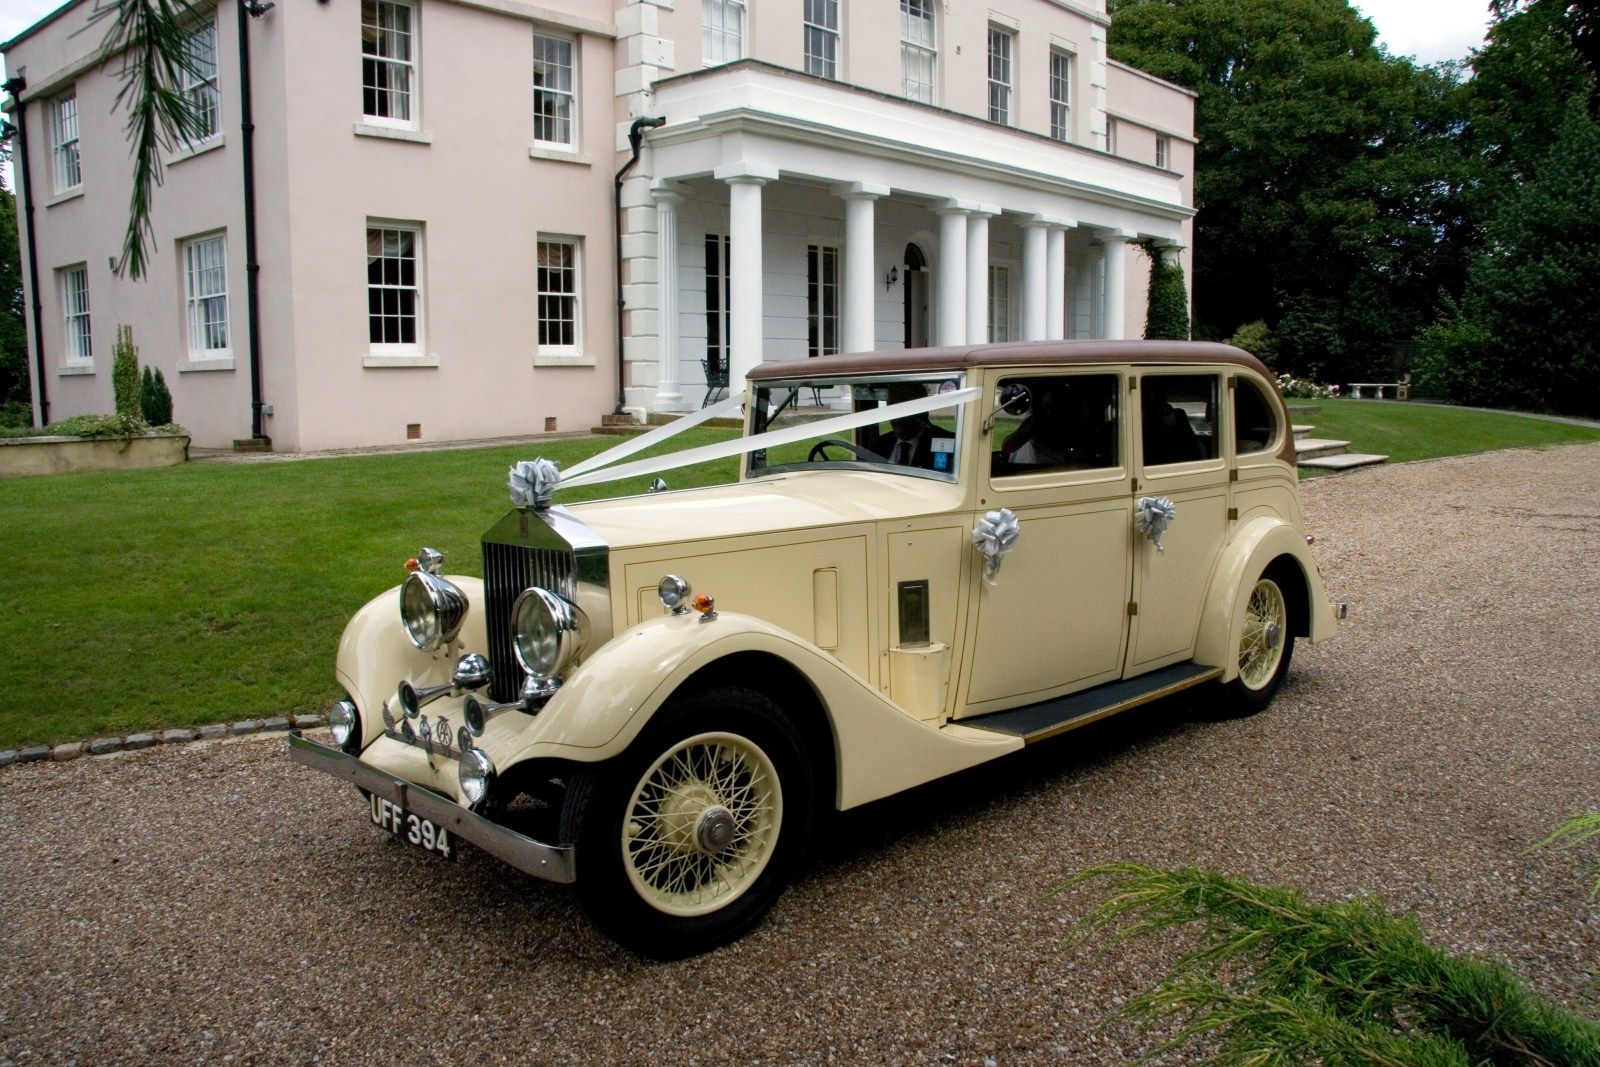 Vintage Rolls Royce Vintage Wedding Car Hire Rochester Kent Vintage Rolls Royce Vintage Car Wedding Rolls Royce